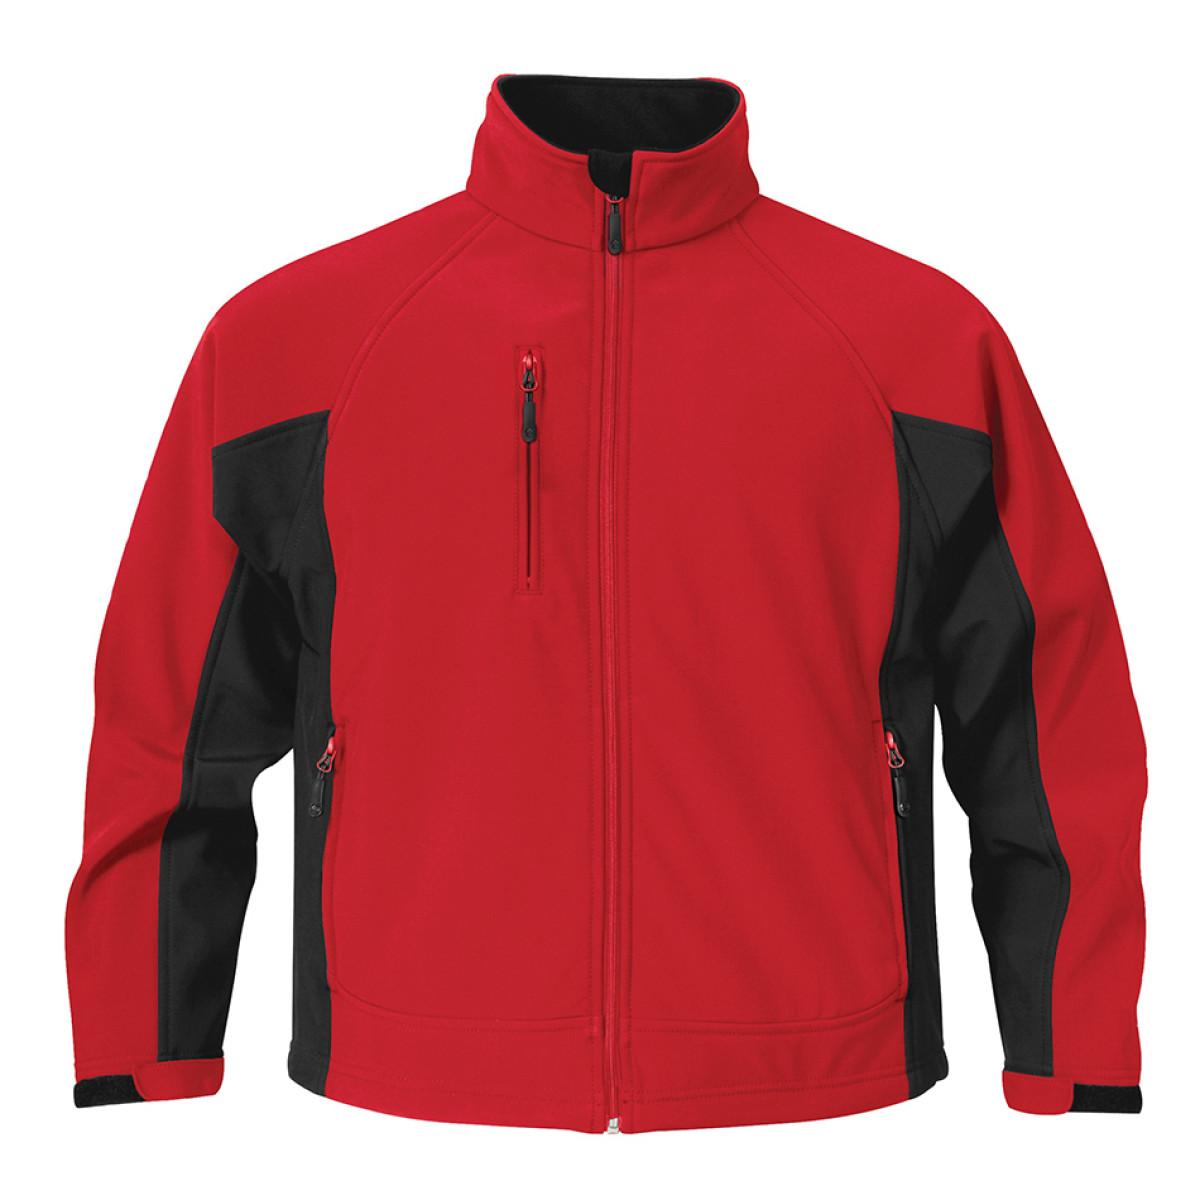 Men's Bonded Jacket